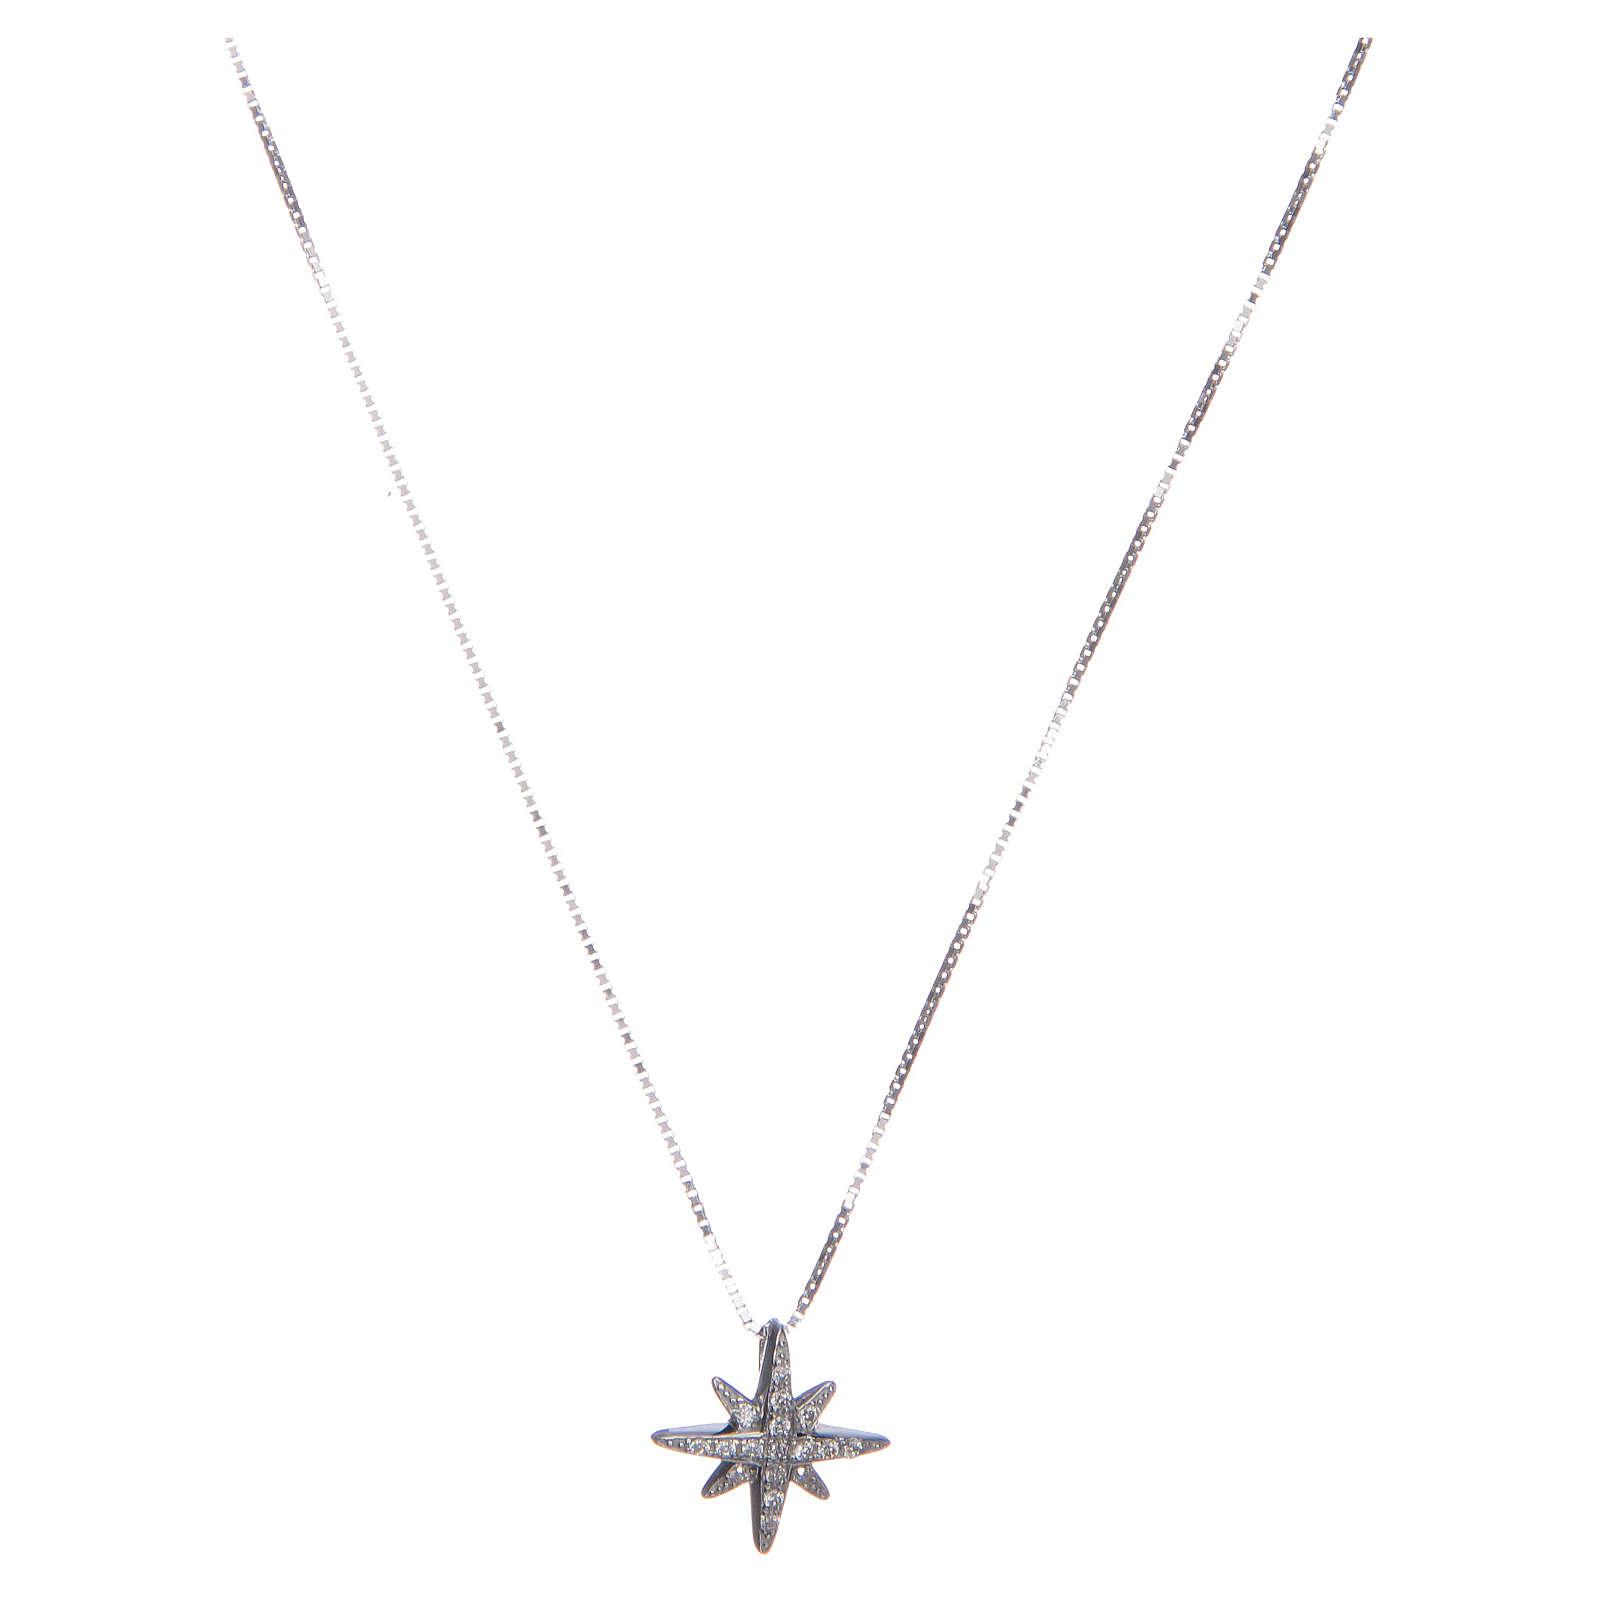 Collana Amen Argento pendente Croce del Sud 4